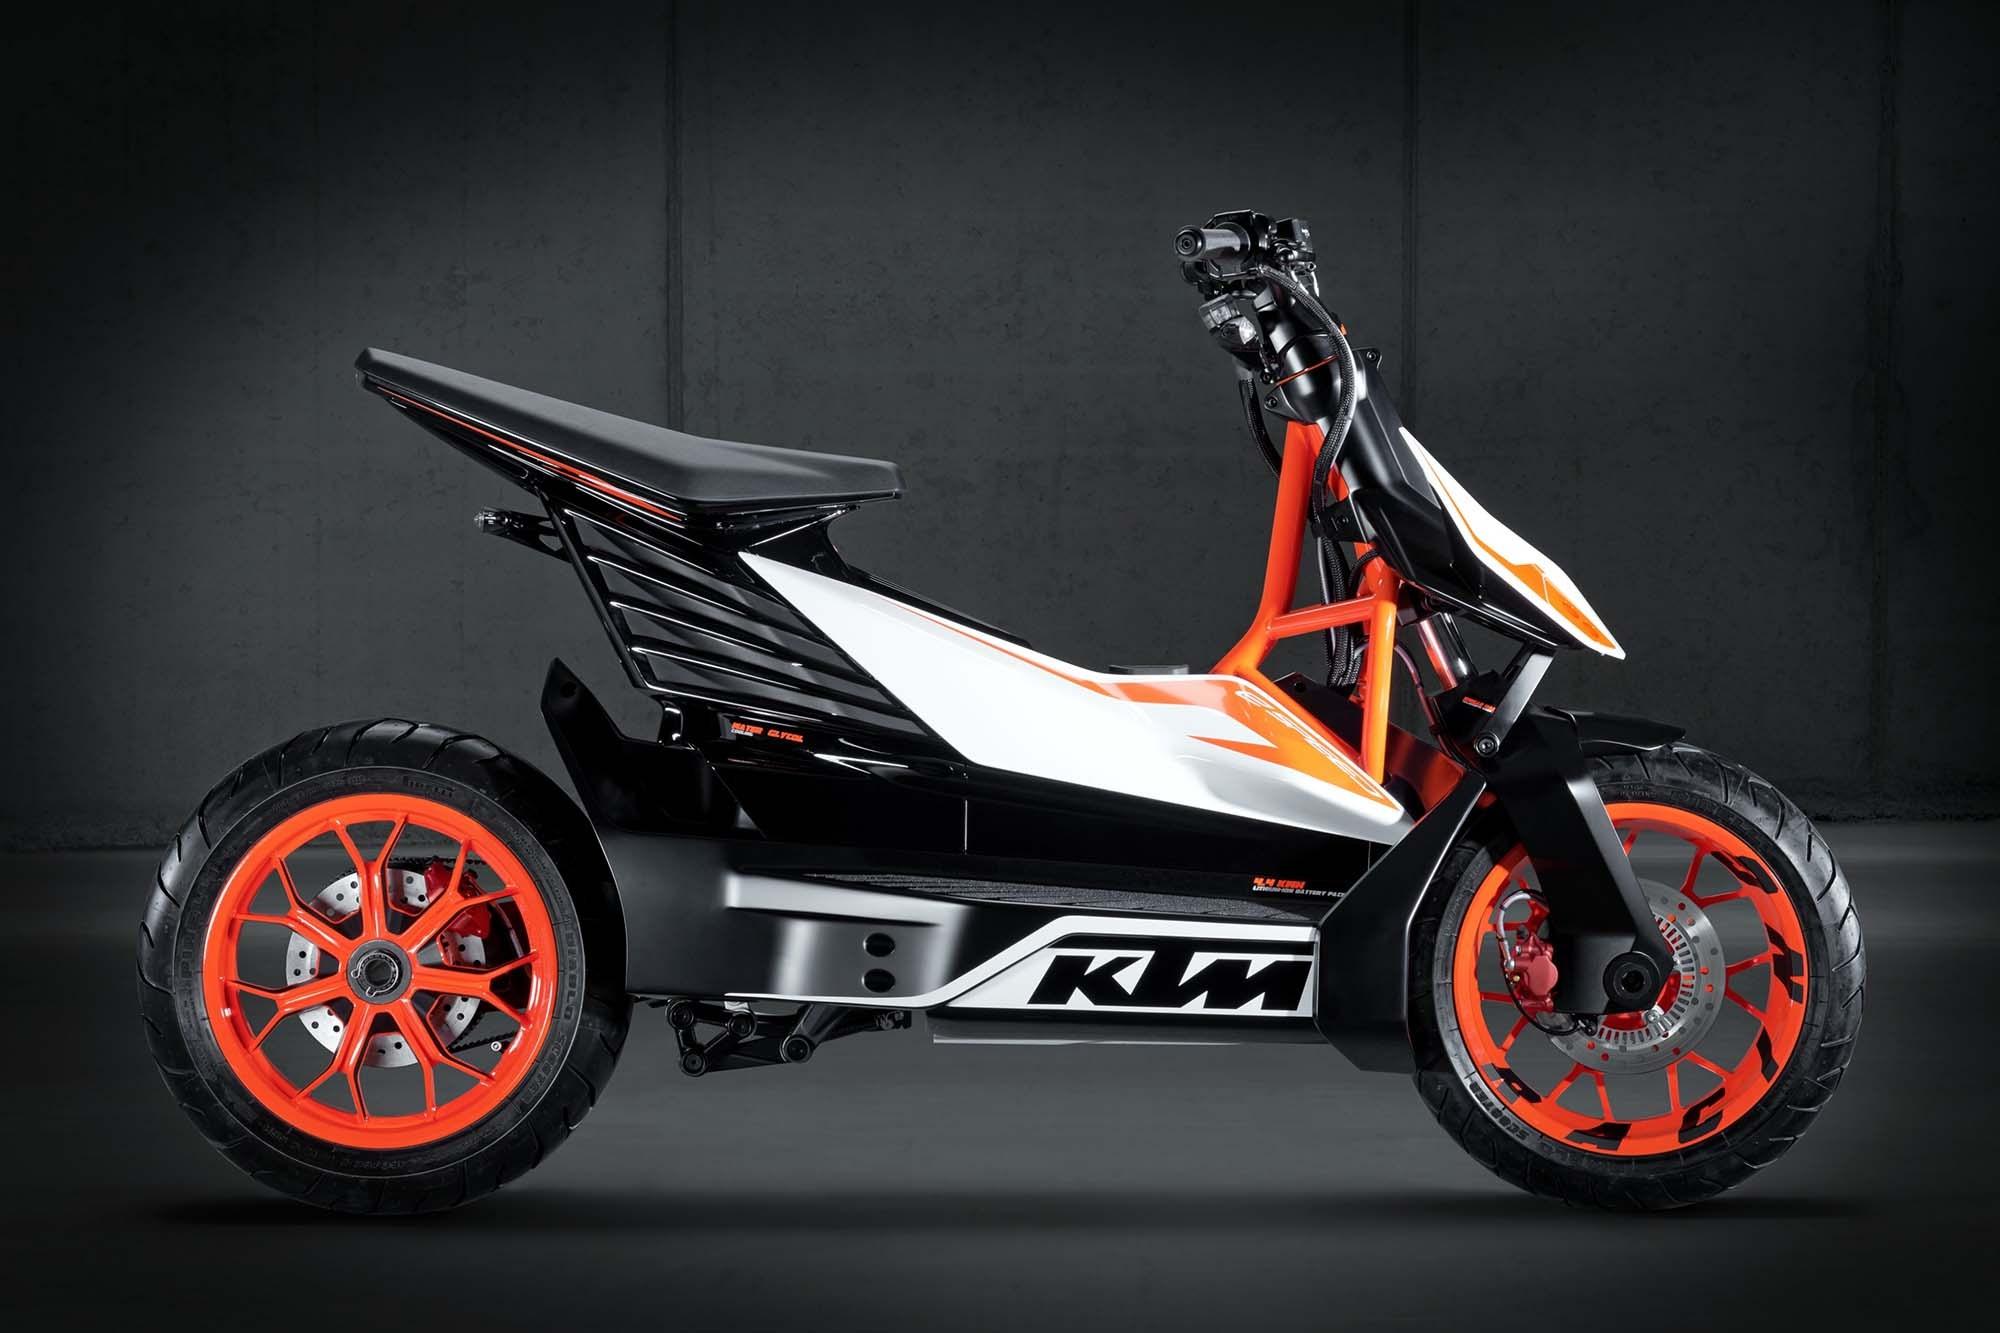 Lo scooter elettrico KTM dovrebbe arrivare entro il 2022 thumbnail